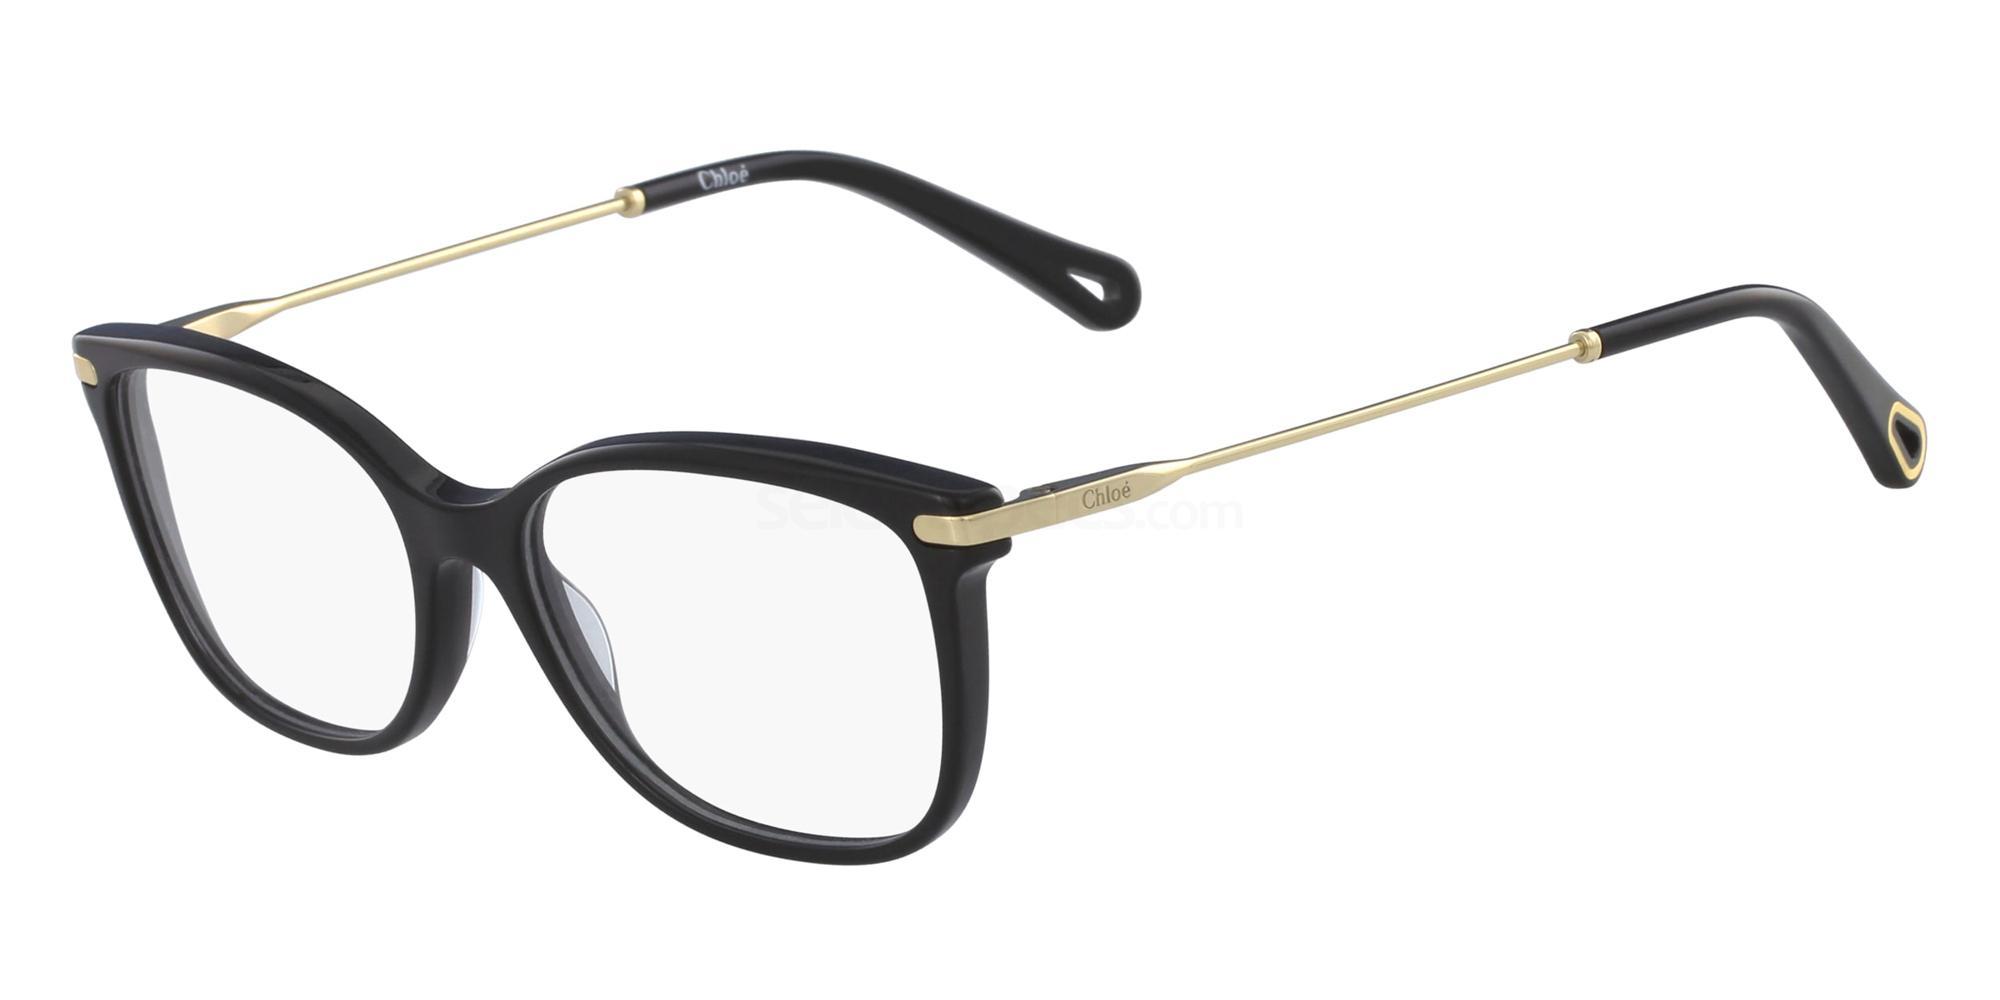 001 CE2718 Glasses, Chloe